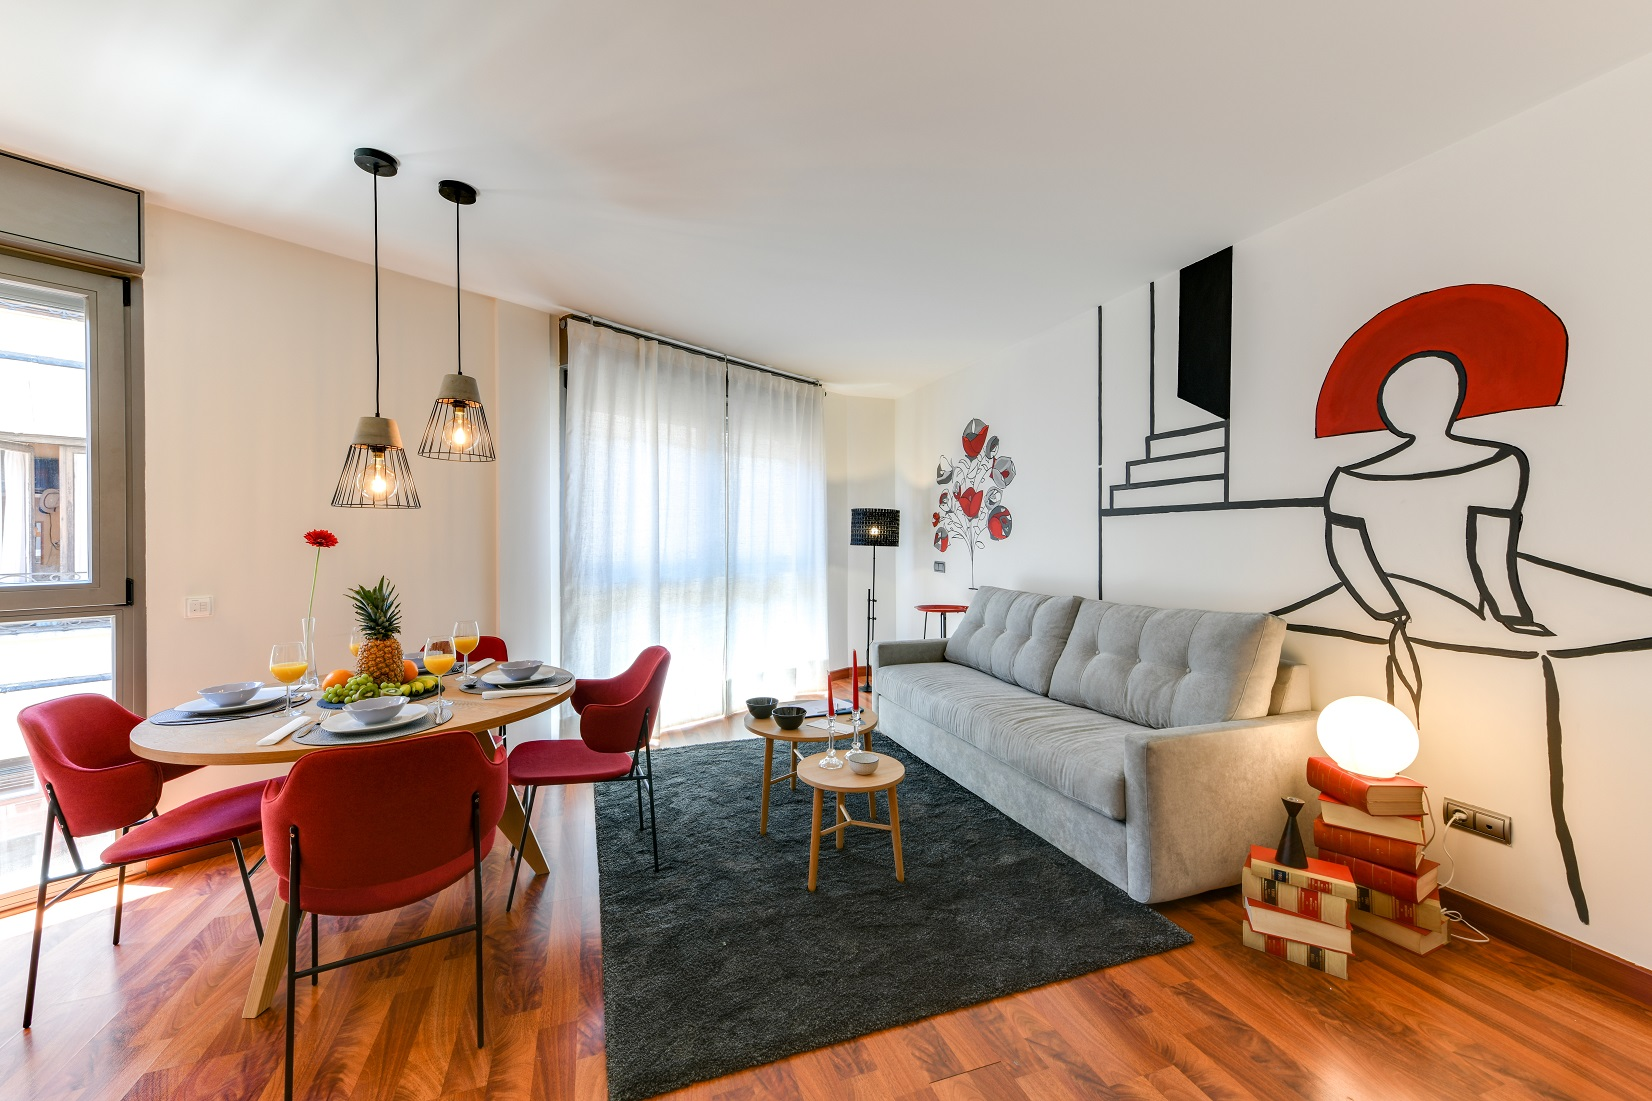 Decor at the Don Pedro Apartments - Citybase Apartments